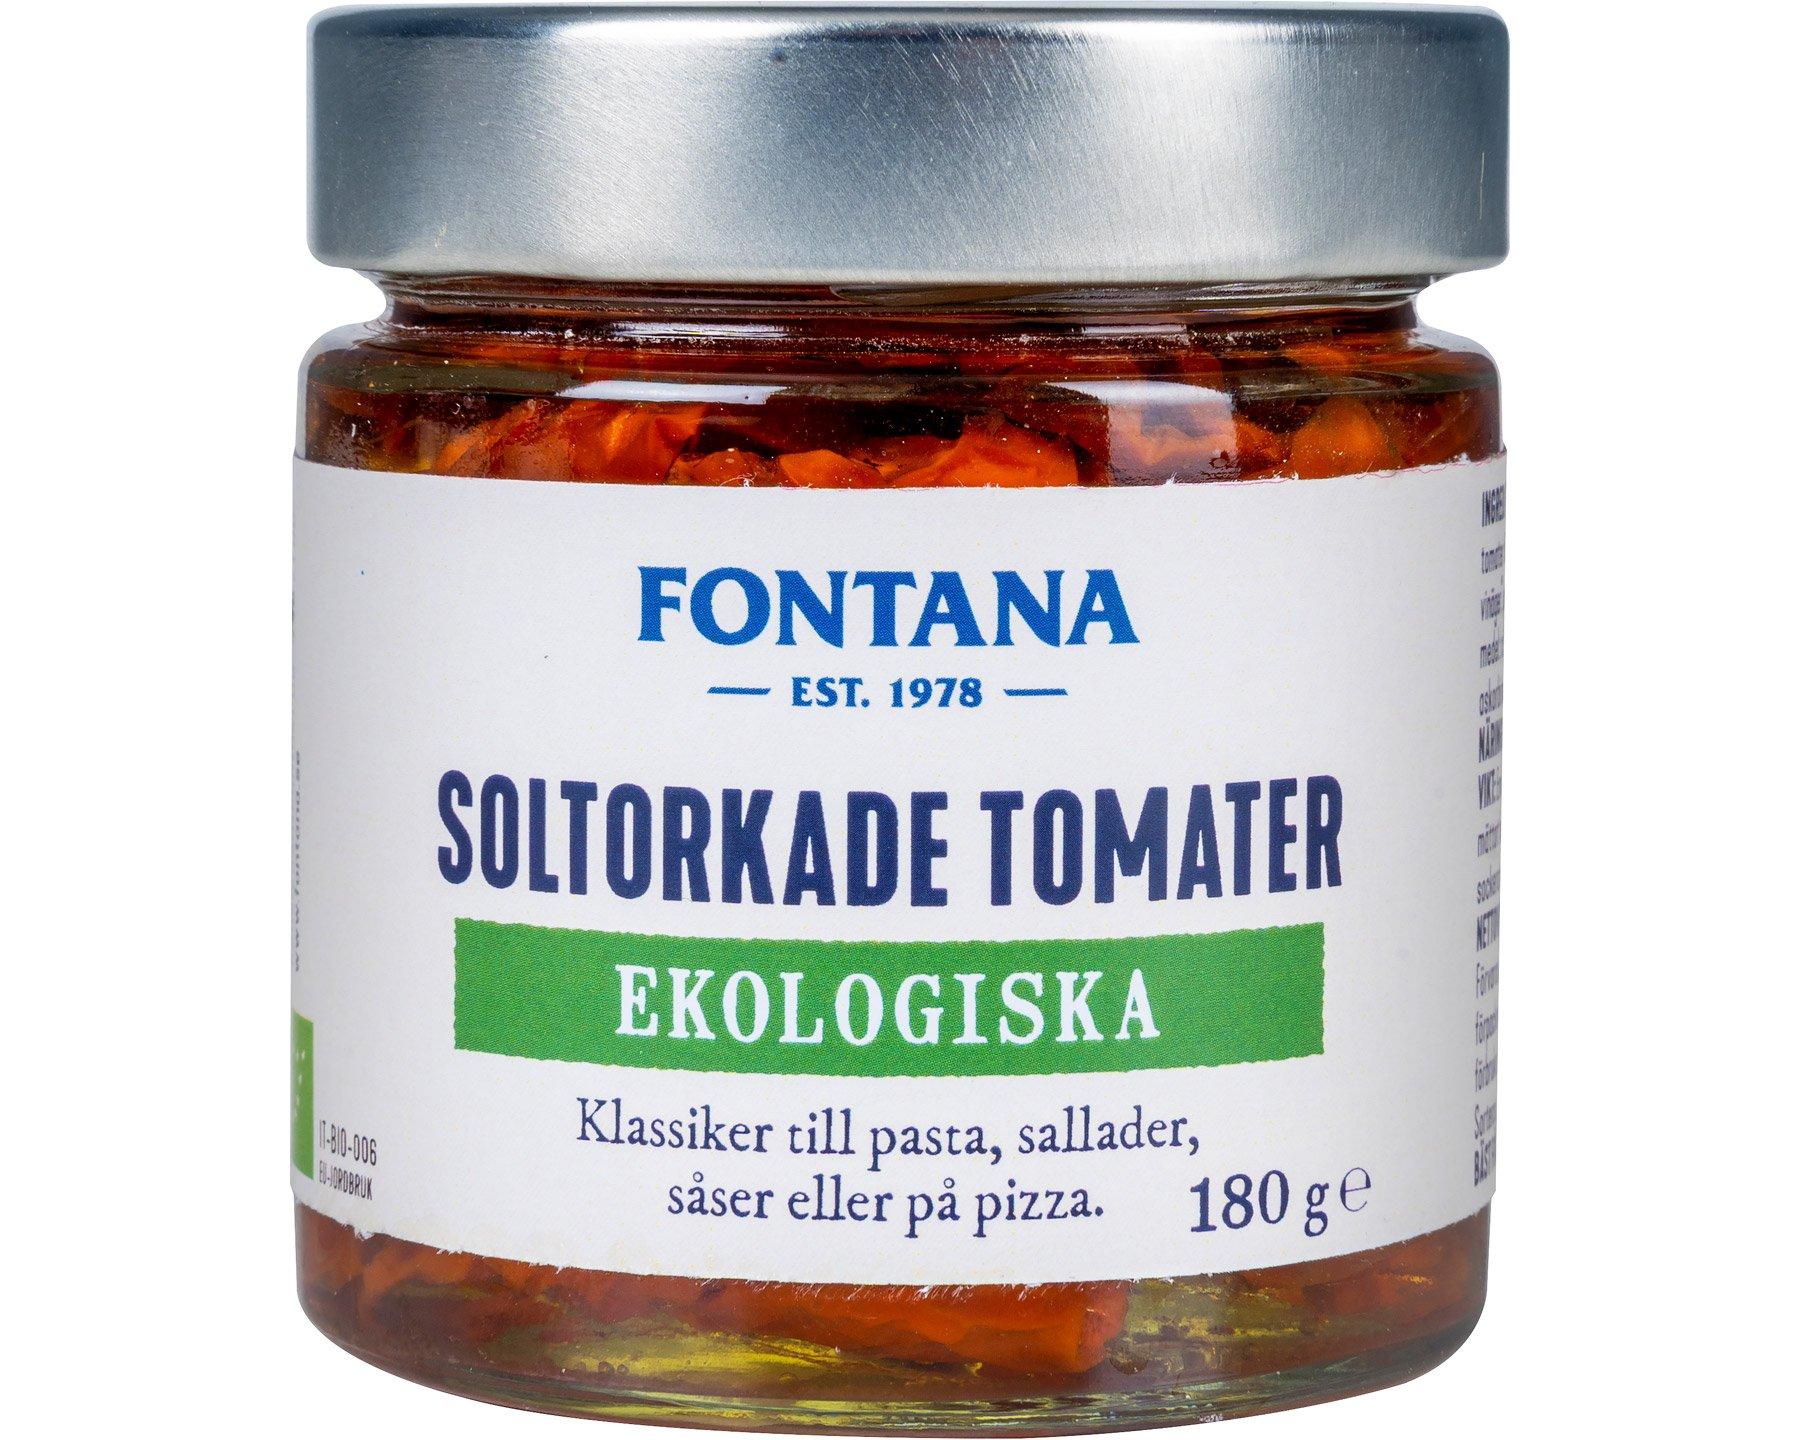 Fontana Soltorkade Tomater Ekologiska 180 g